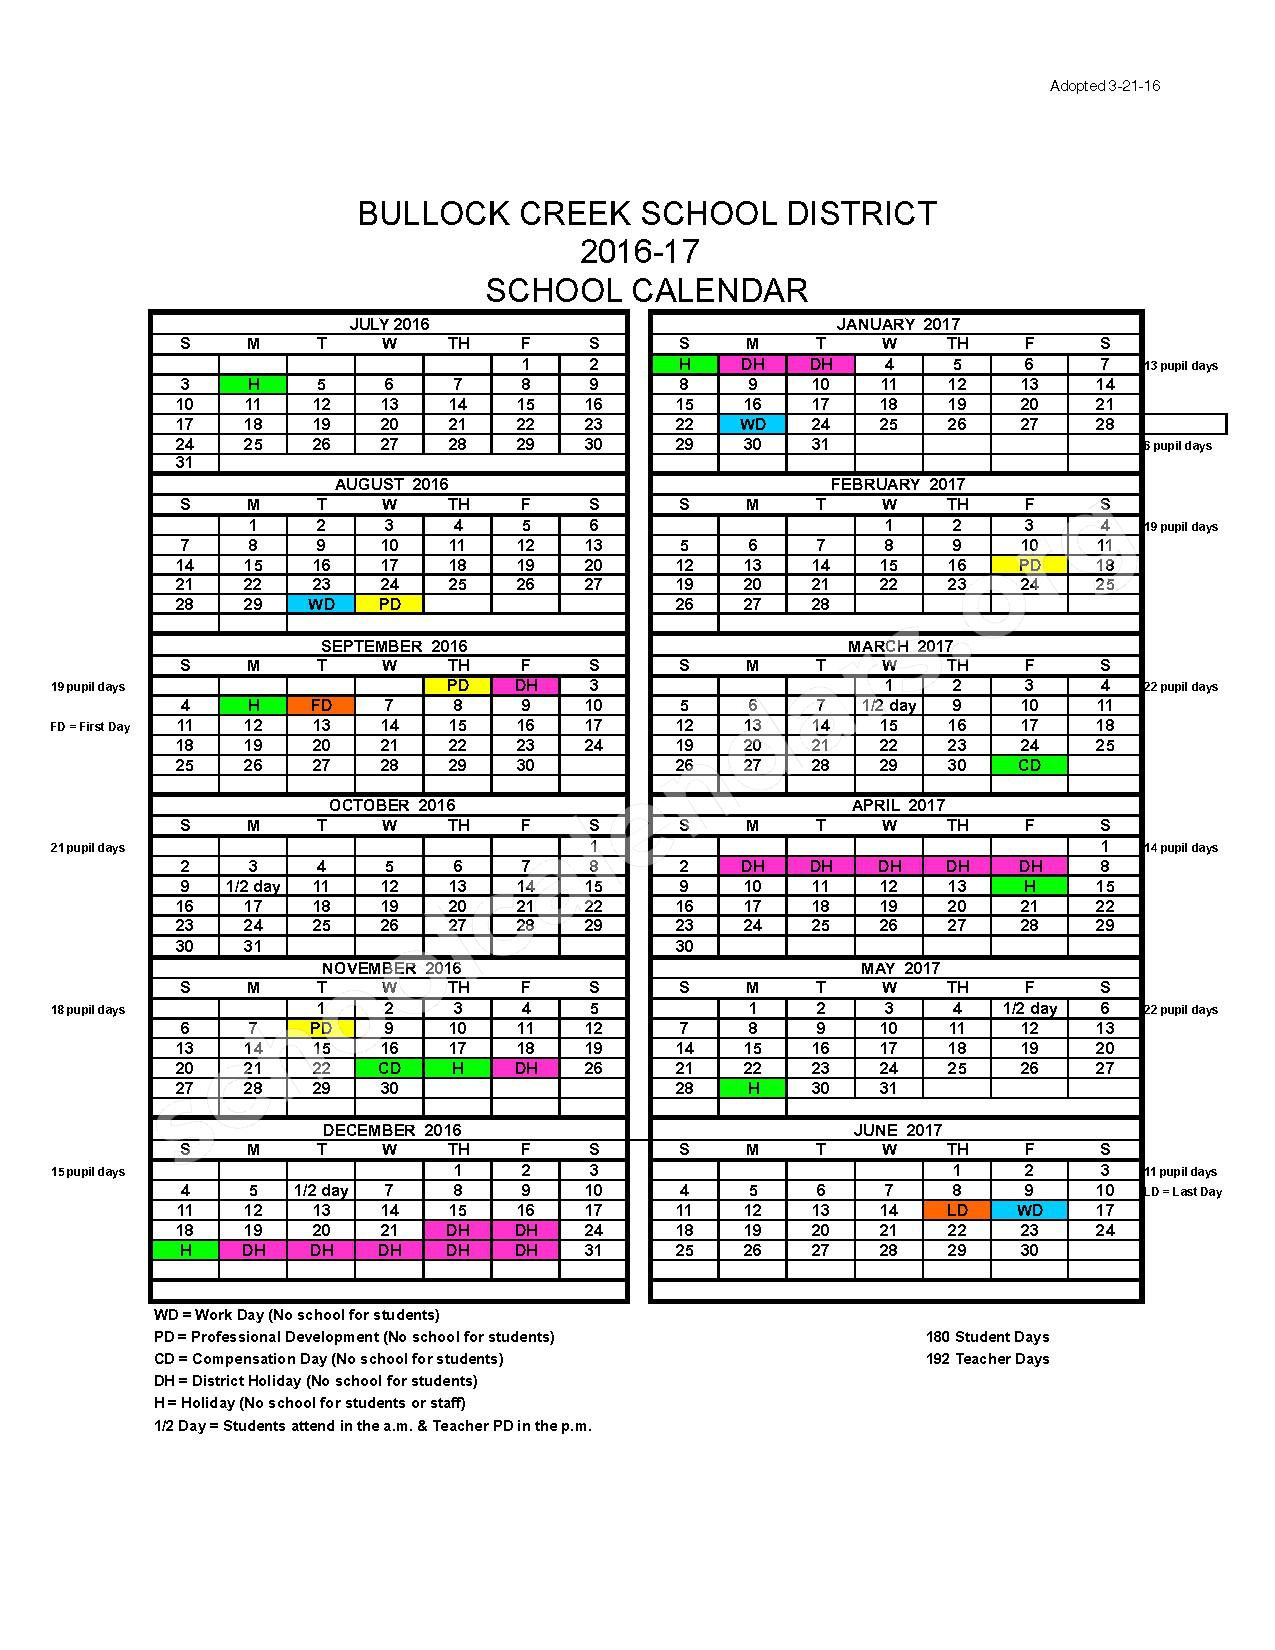 2016 - 2017 School Calendar – Bullock Creek School District – page 1